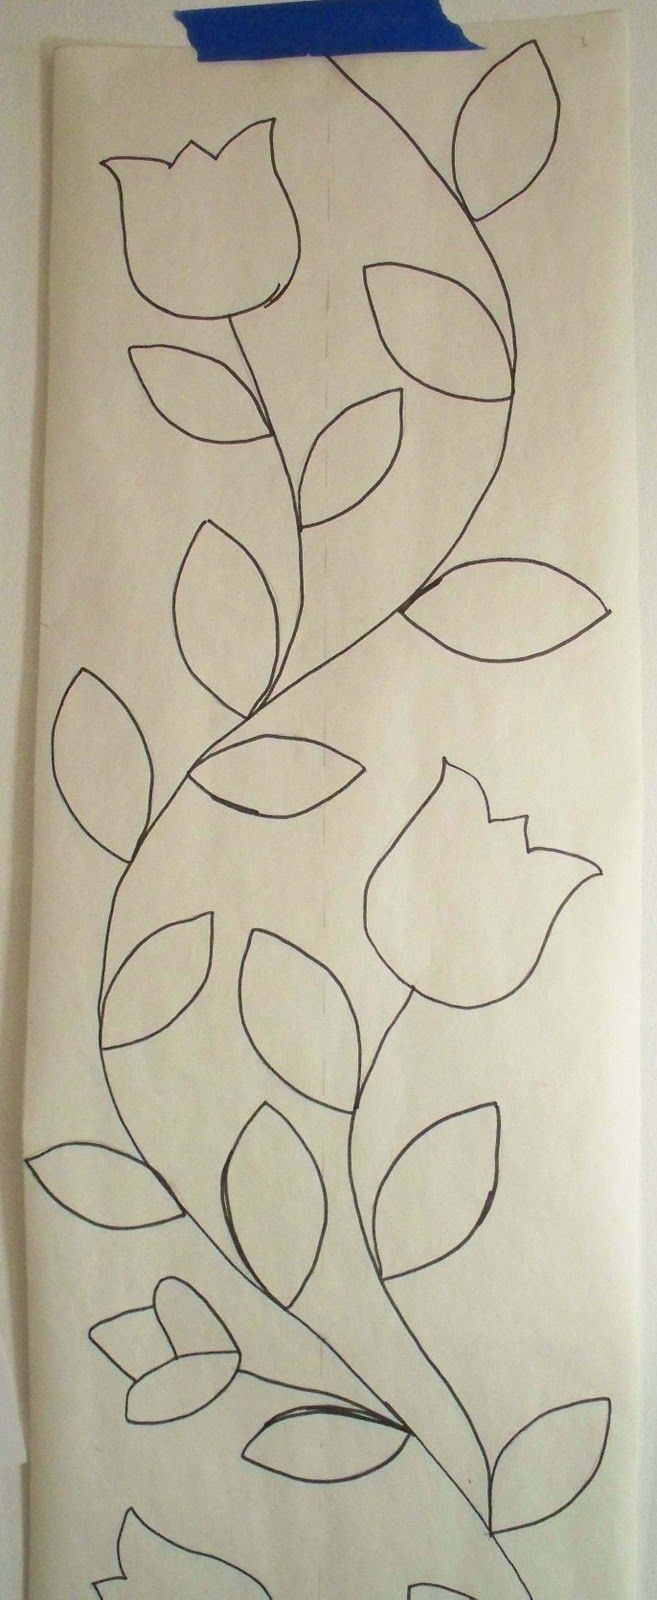 Infinitos tulipanes | puntos portaretratos | Pinterest | Infinito ...